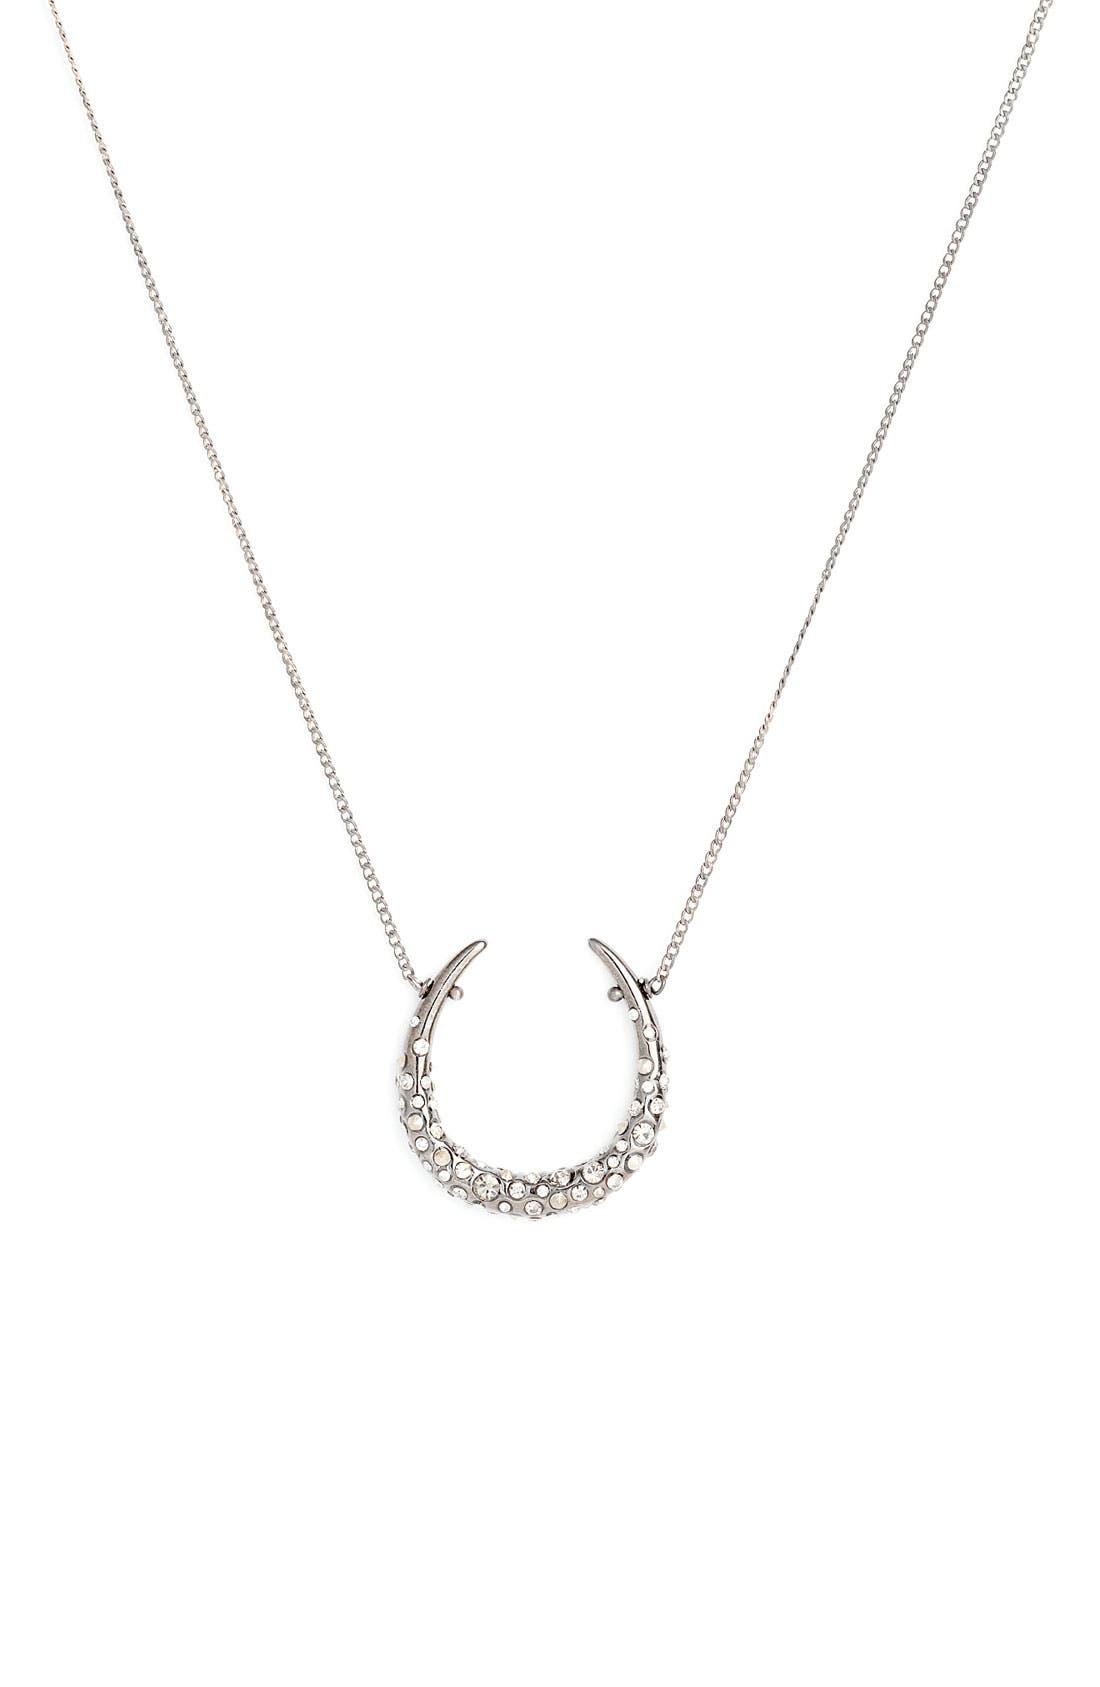 ALEXIS BITTAR 'Miss Havisham' Encrusted Horseshoe Necklace, Main, color, 040